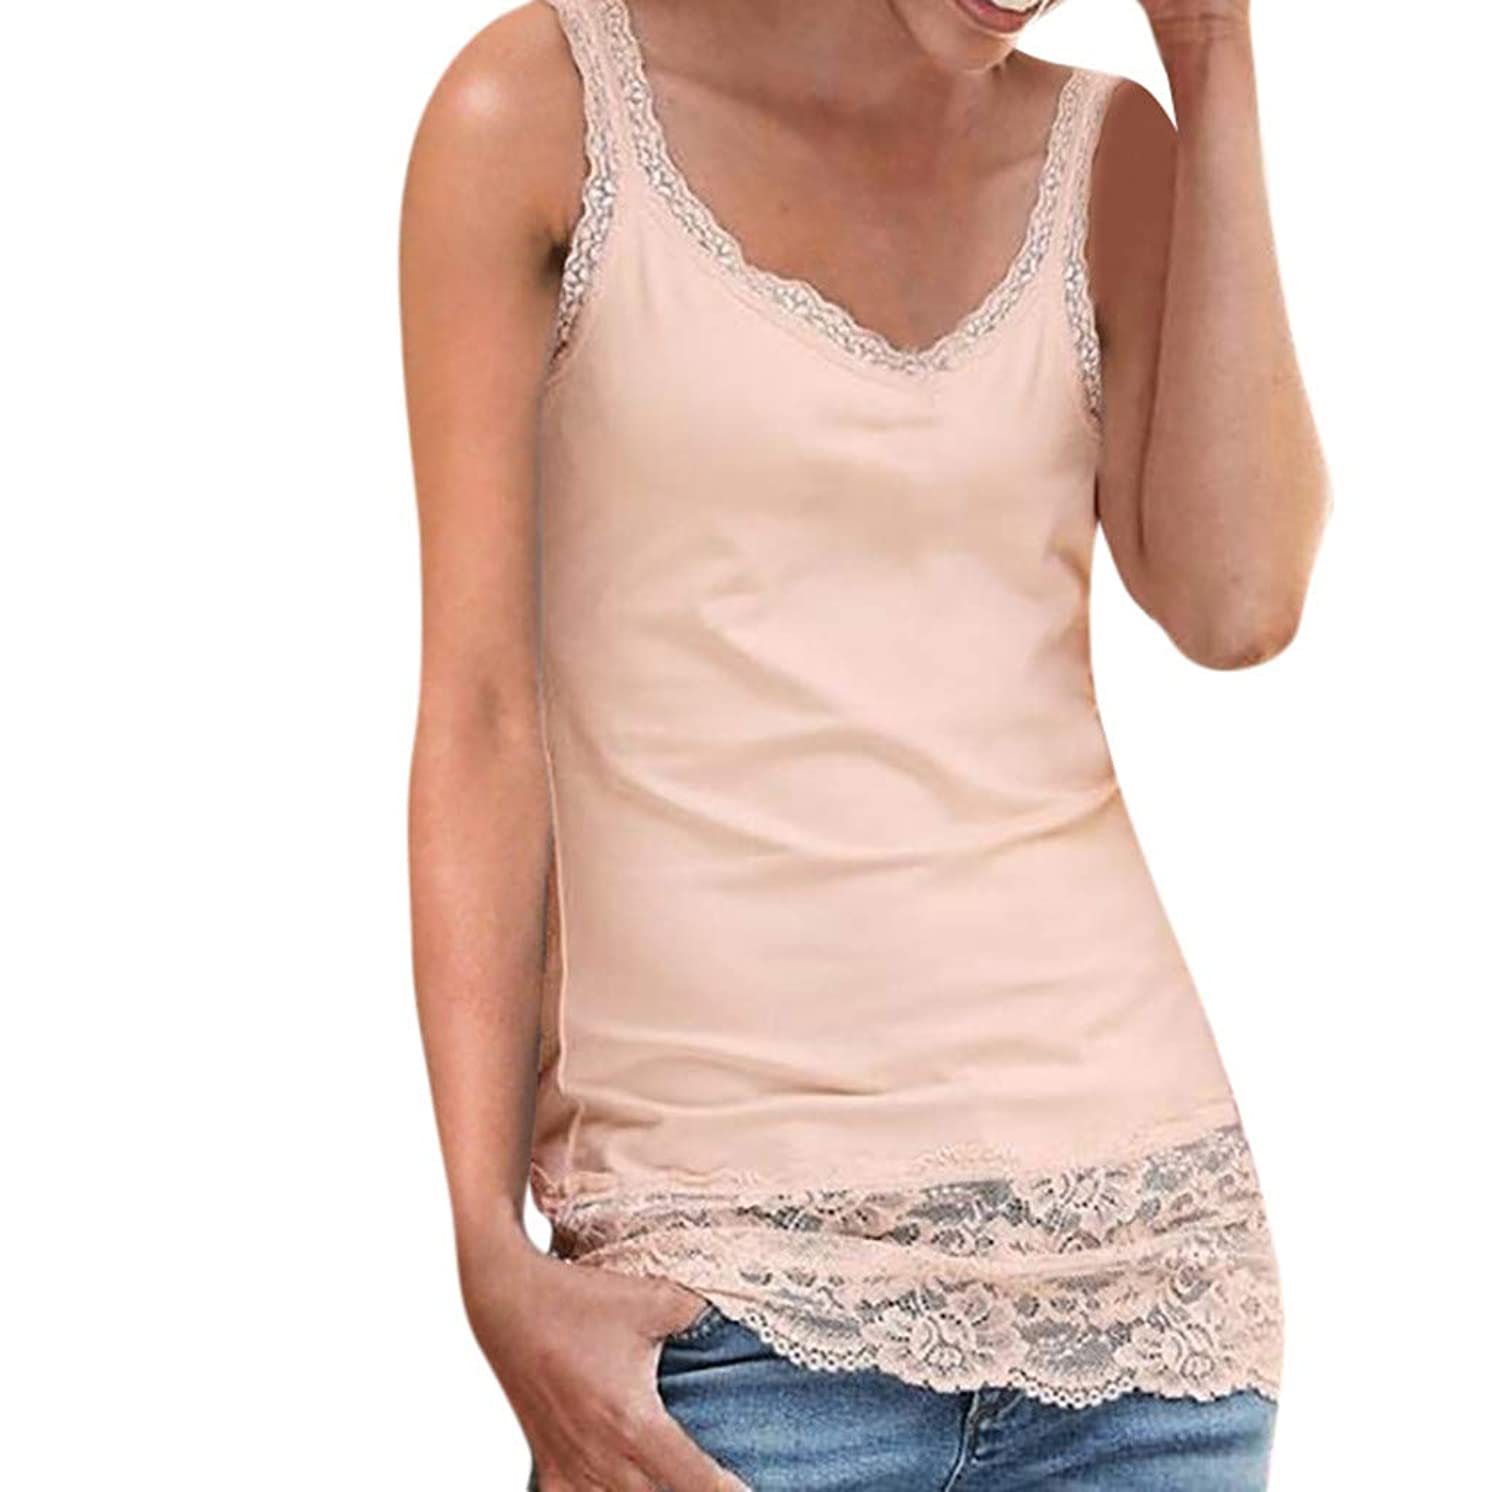 Xinantime Women's Lace Stitching Sleeveless Vest with Lace Trim Hem Embellished Beach Tank Top Shirt